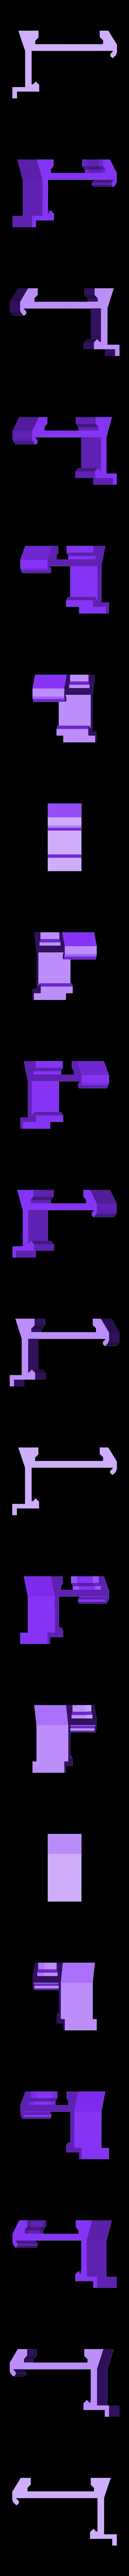 Ender_Toolholder_Fan_Mount_v2.21.stl Télécharger fichier STL gratuit Porte-plume Ender 3 avec BLTouch • Plan à imprimer en 3D, maxsiebenschlaefer13